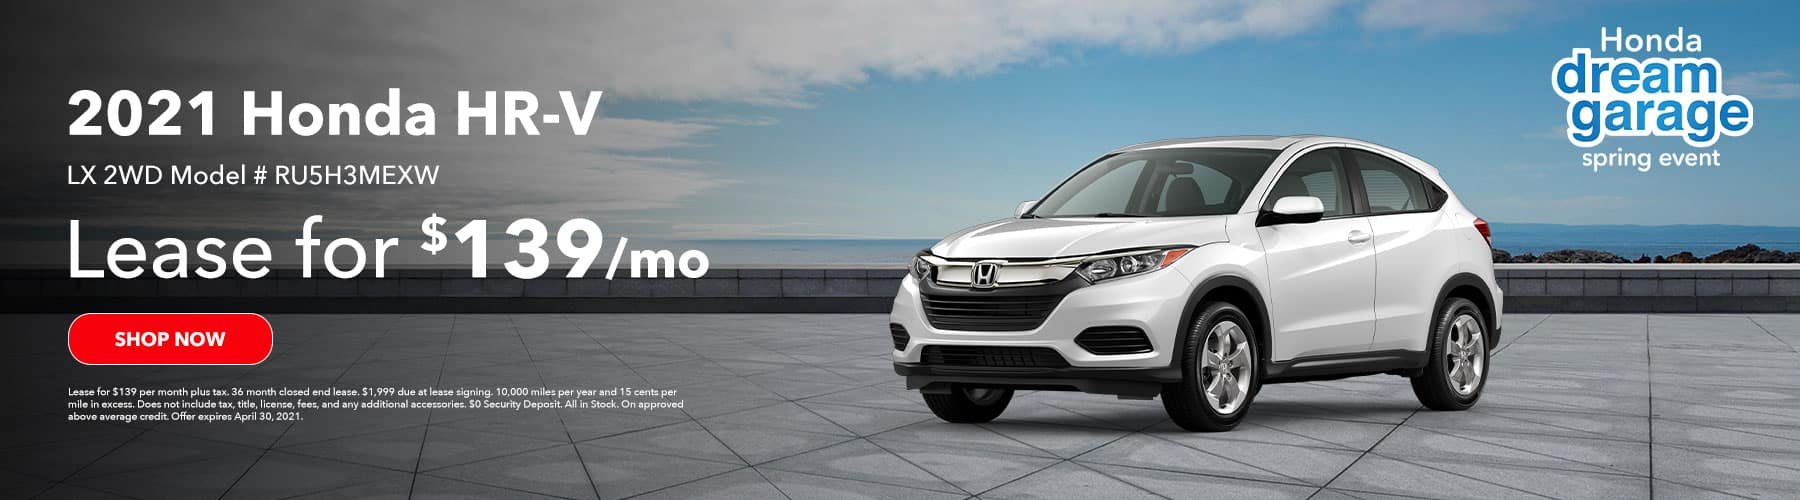 2021 Honda HR-V LX 2WD, Lease for $139 per month